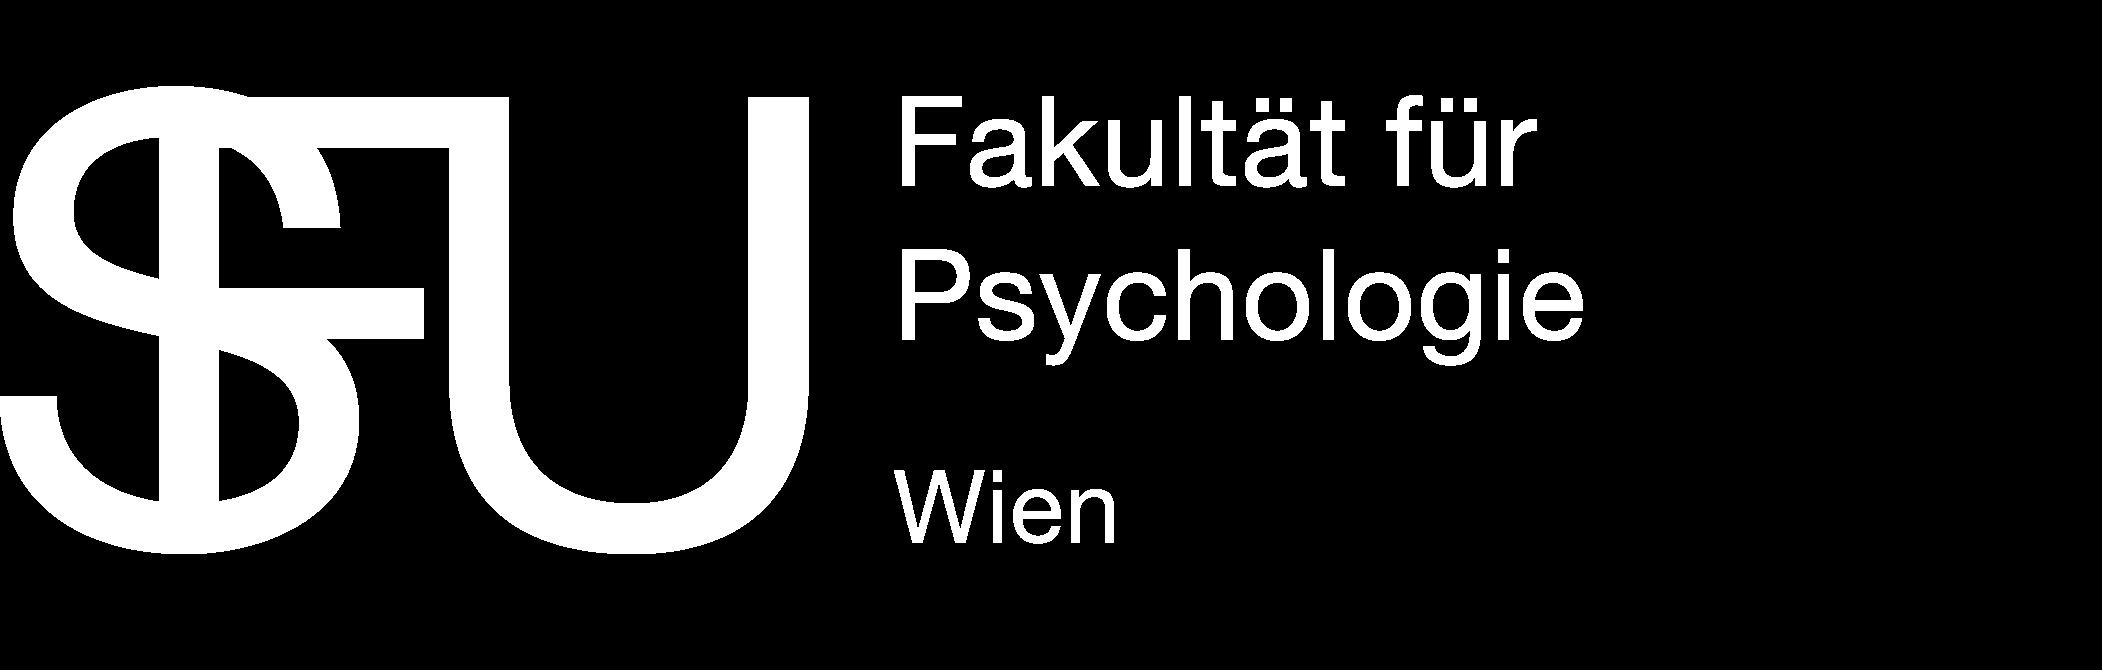 logos_fuerweb-07